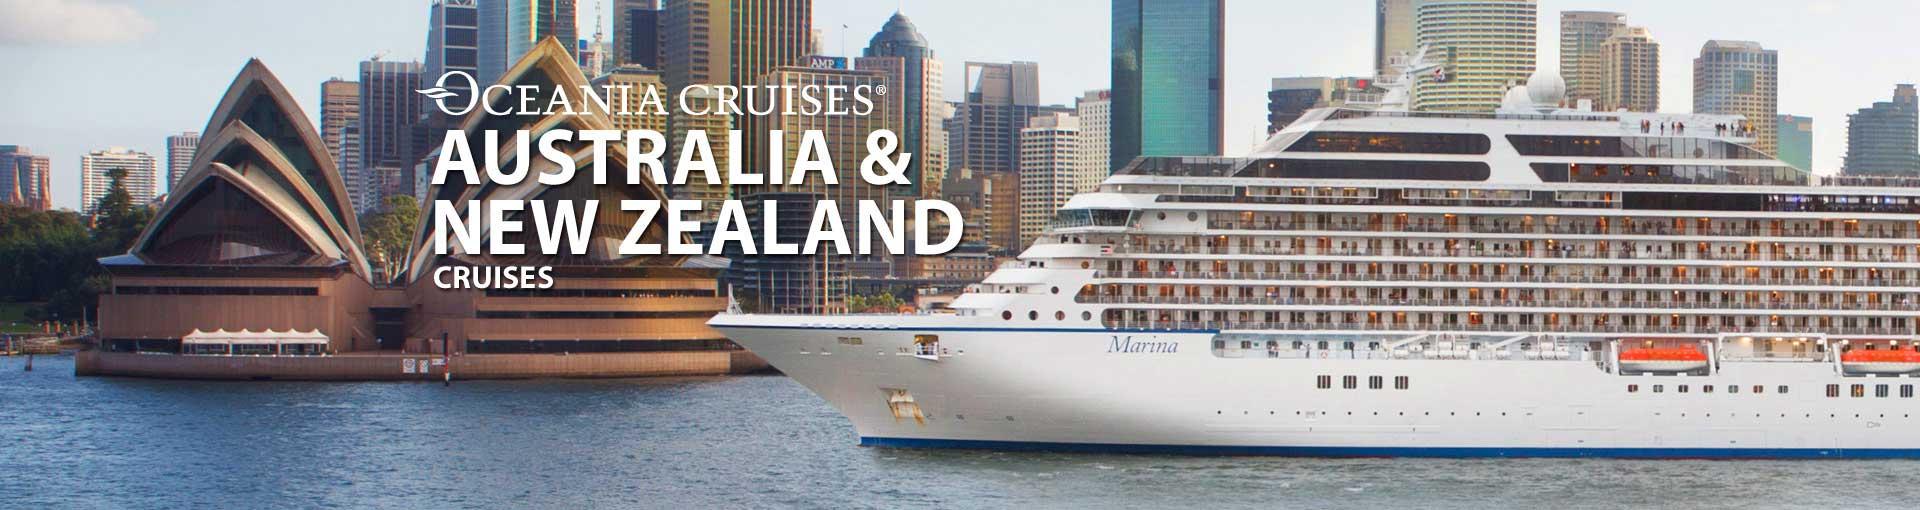 Oceania Australia Cruises And New Zealand Oceania - Cruises to new zealand